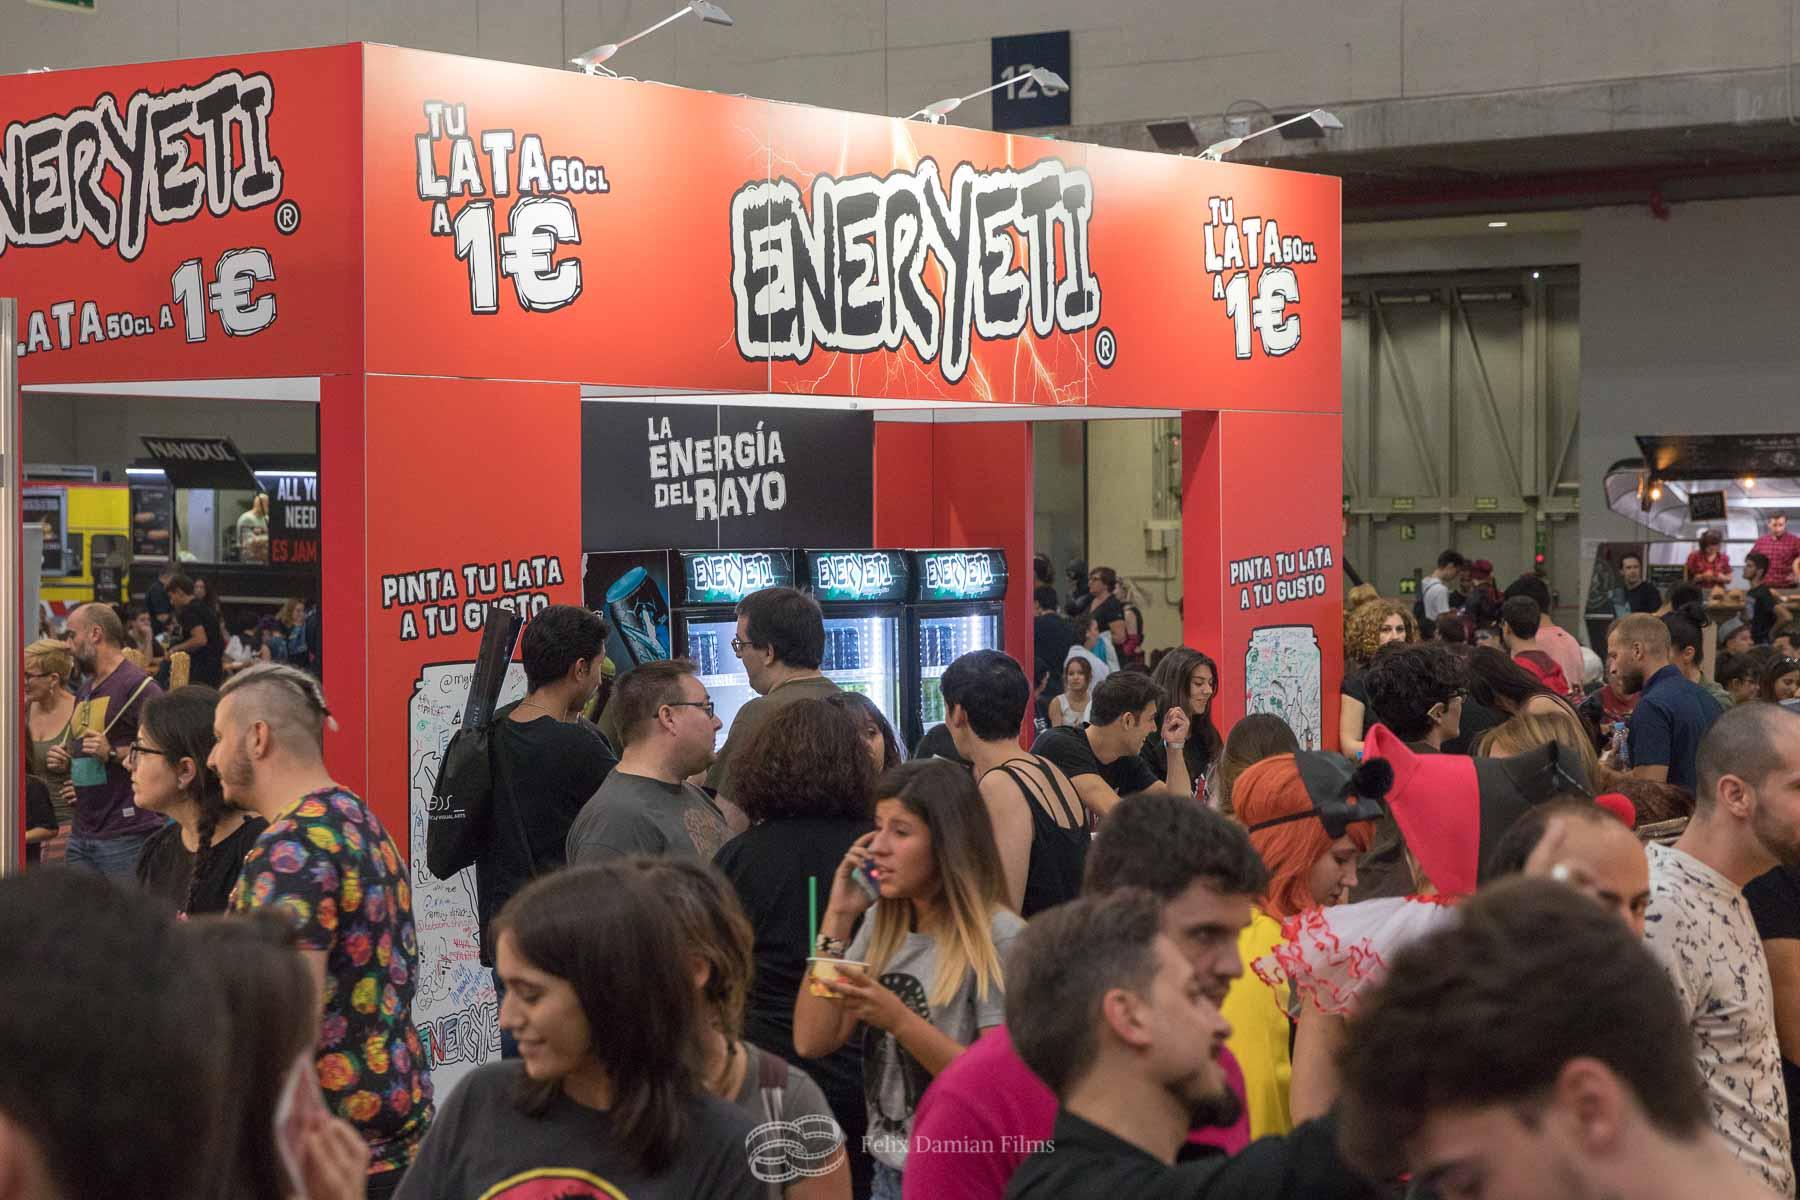 eventos eneryeti ifema